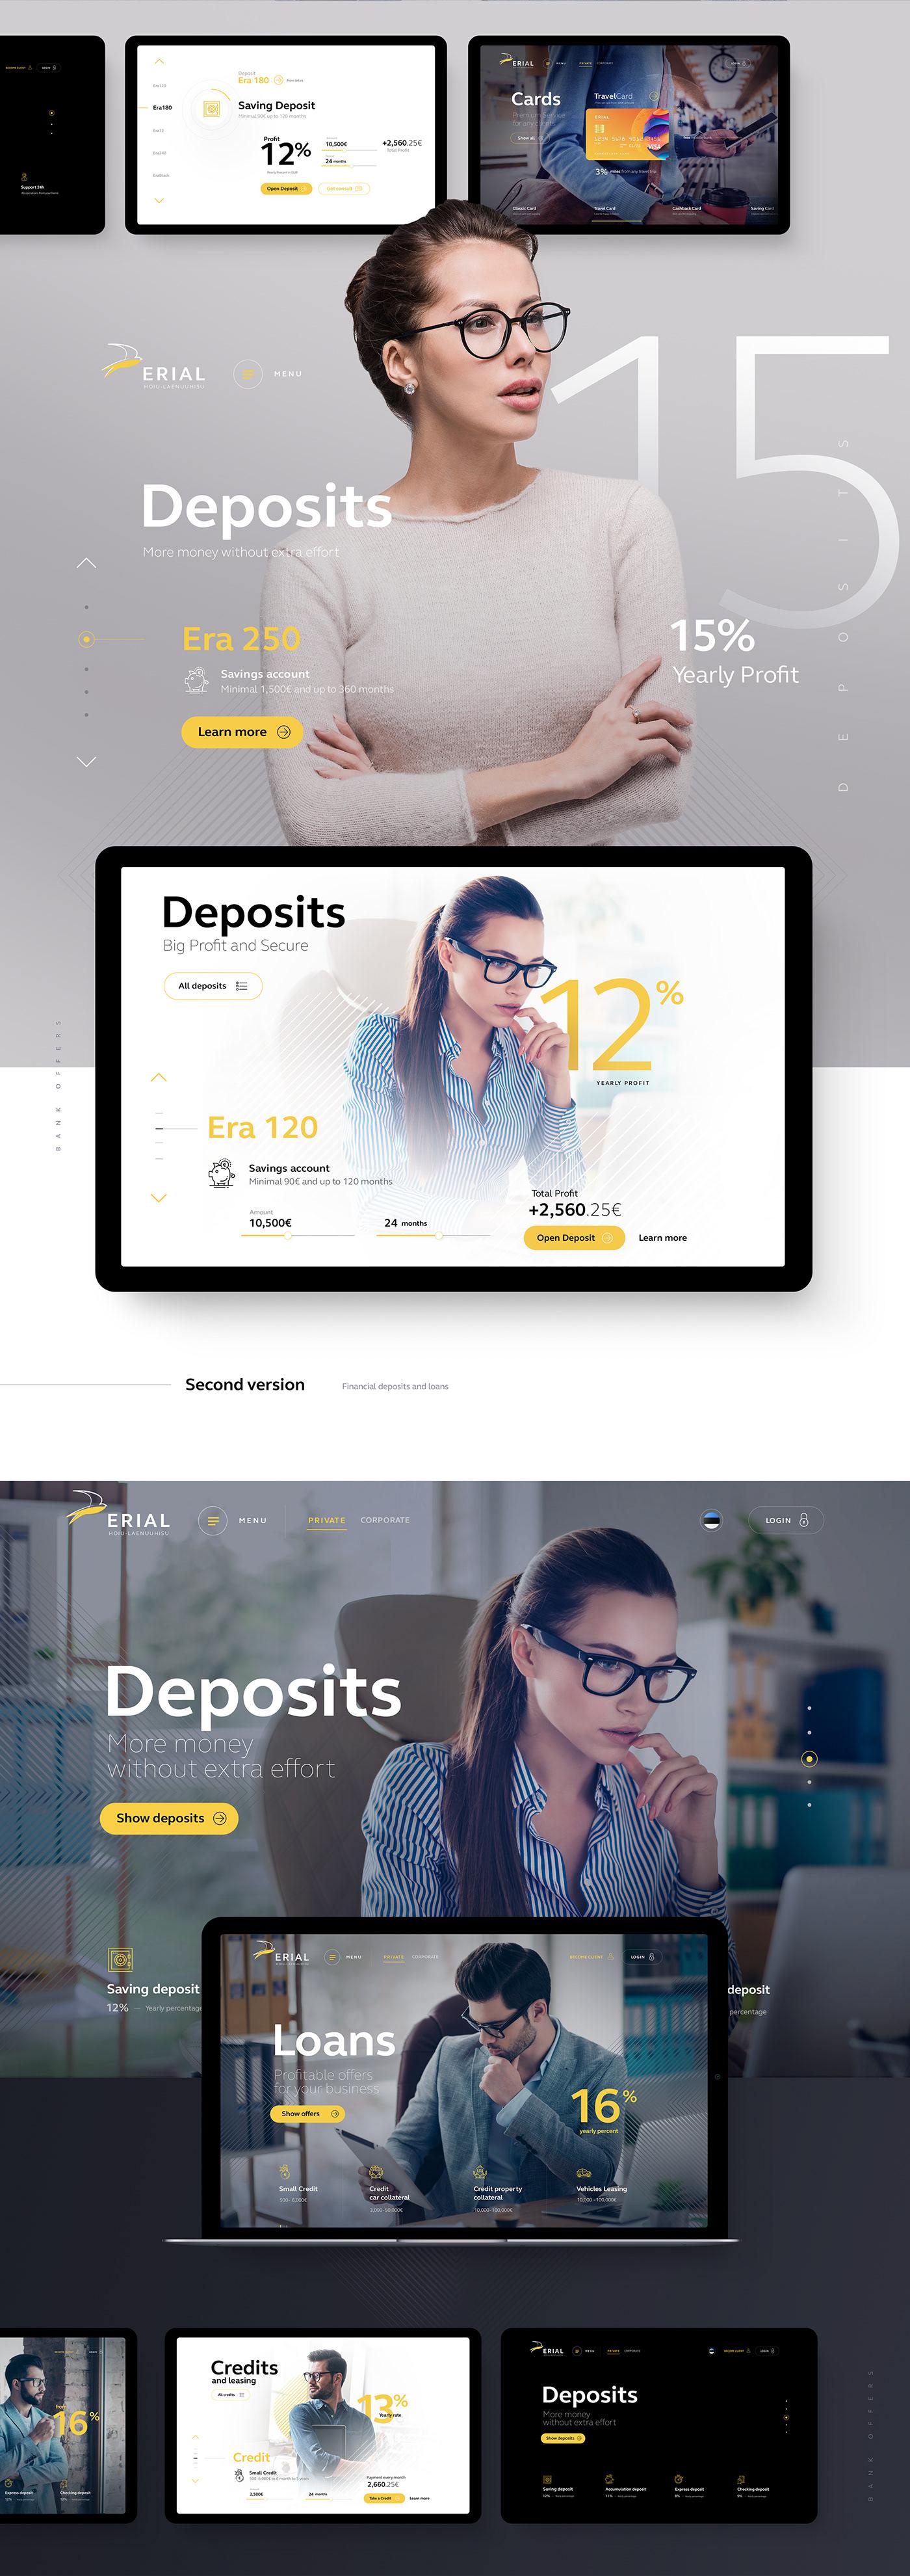 agenliga com deposit